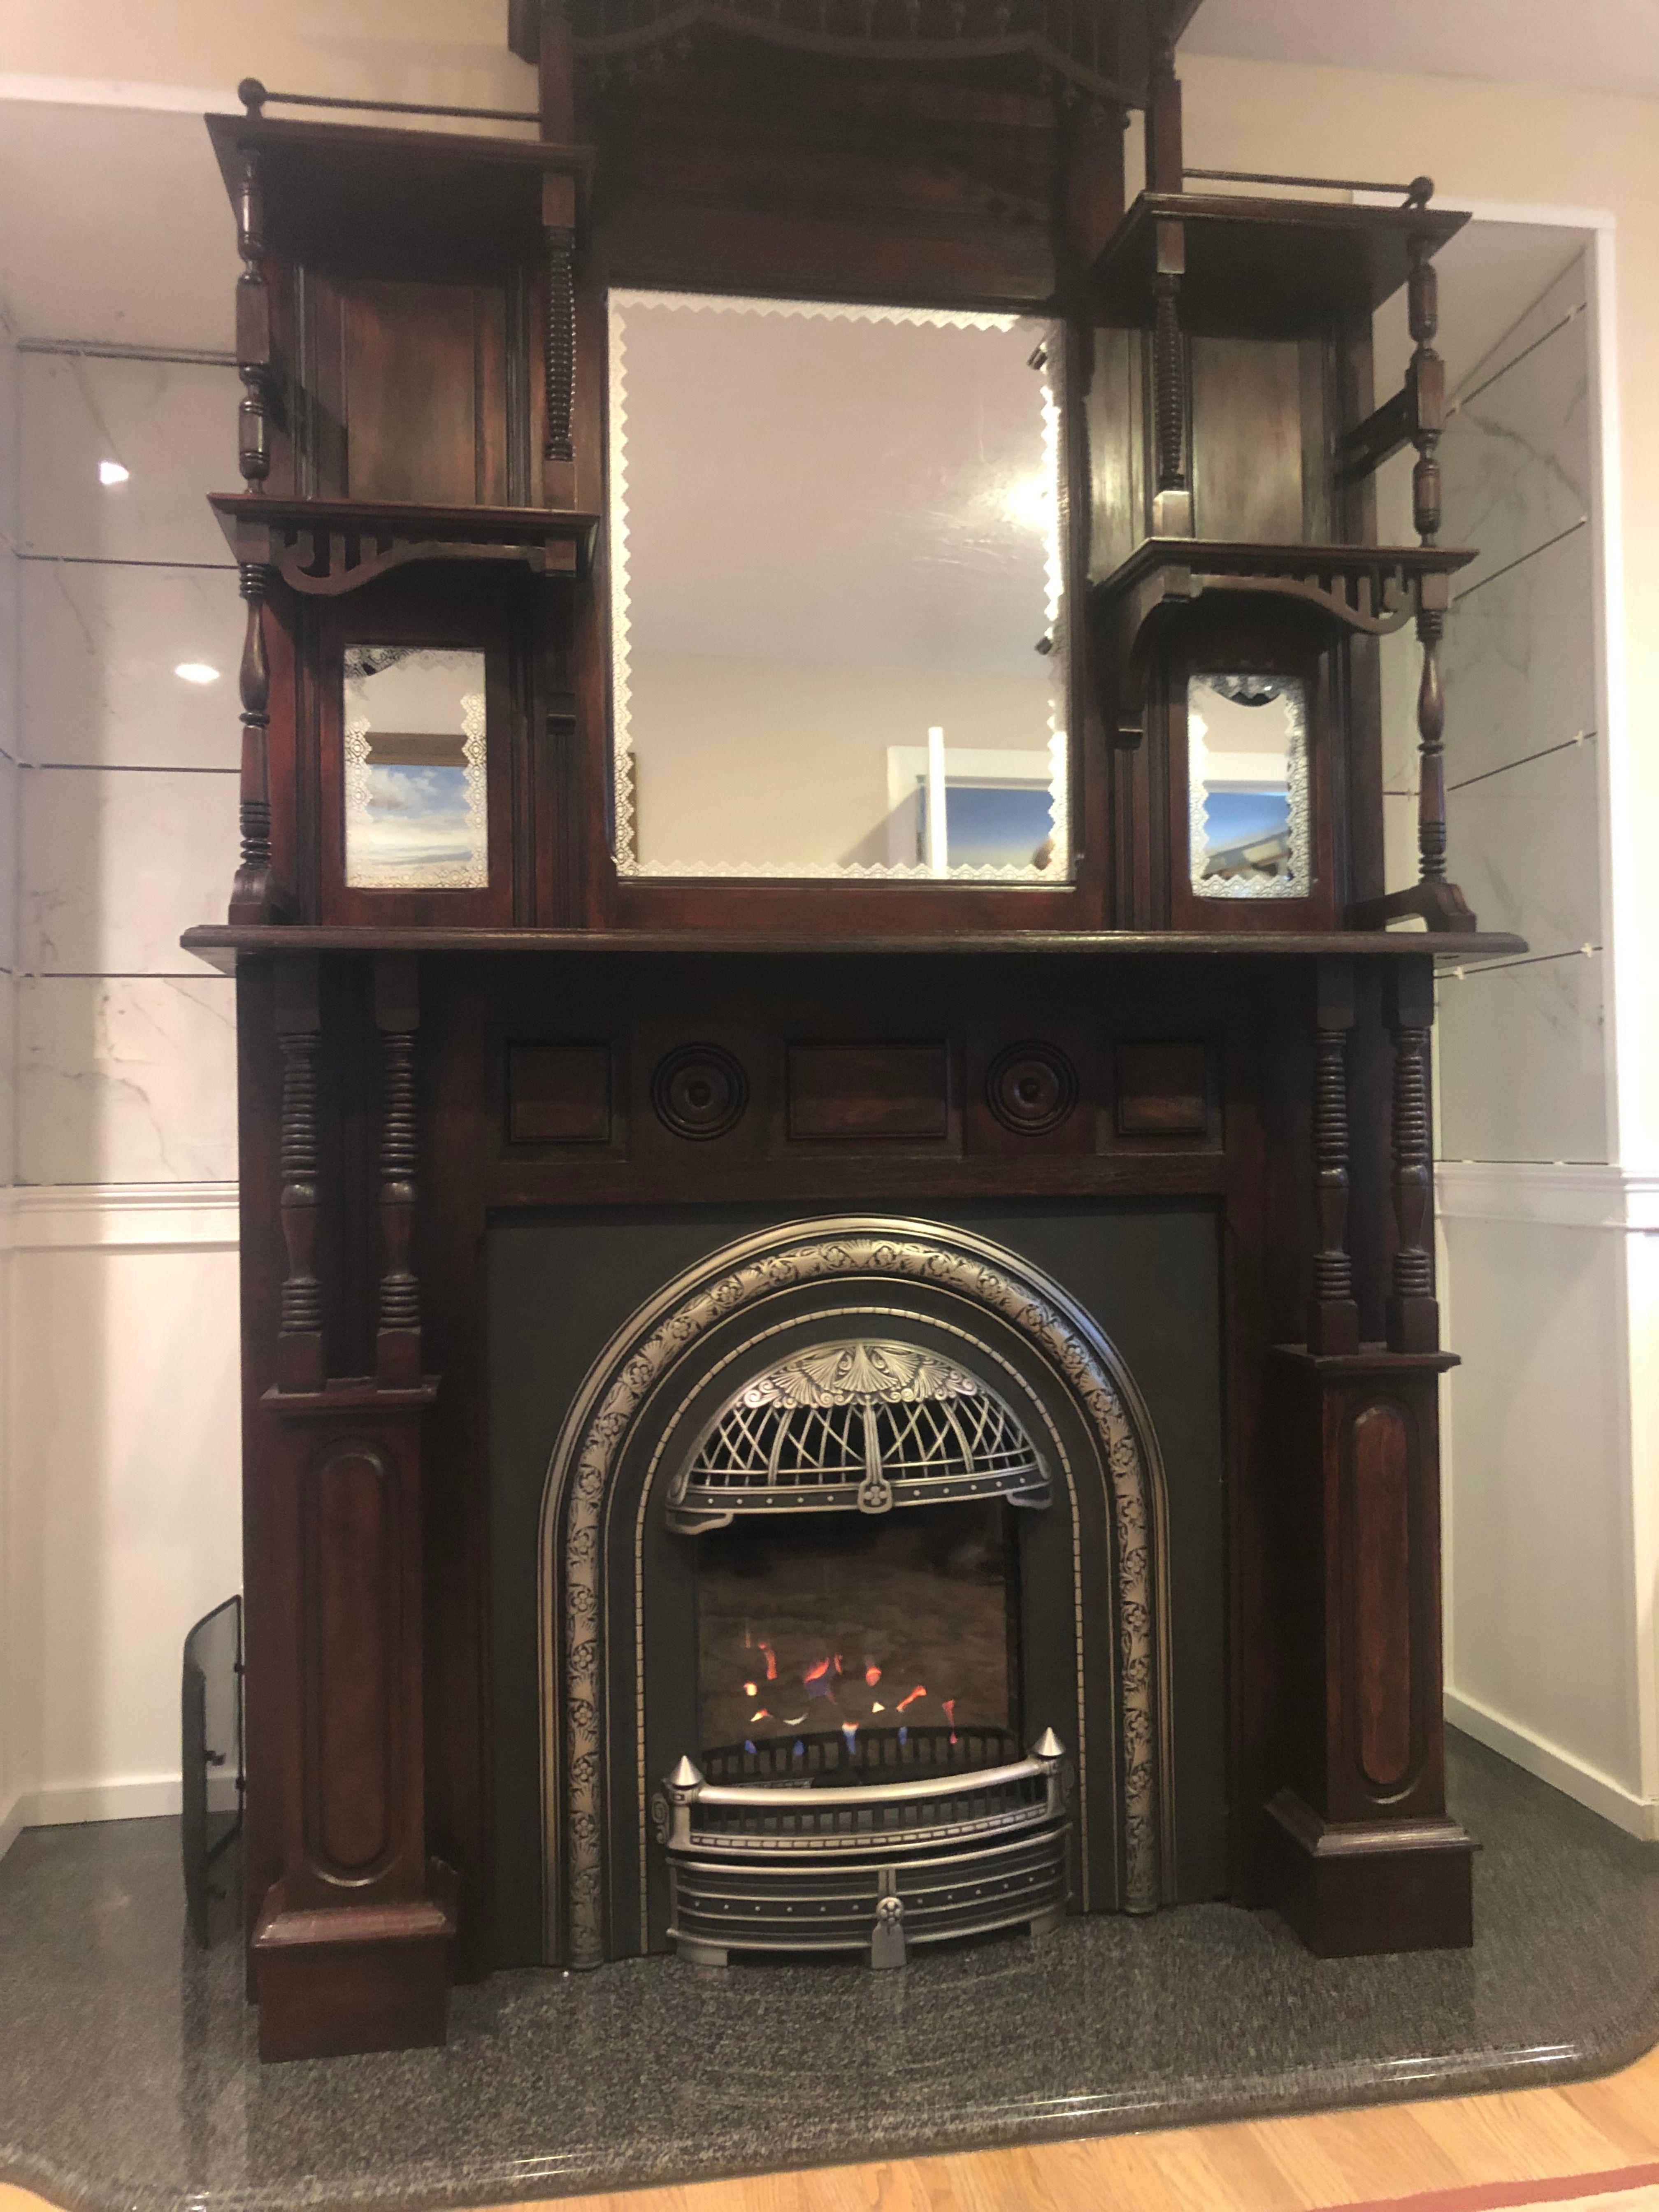 Make Valor Model Portrait Type Gas Fireplace Stove Fireplace Stove Gas Fireplace